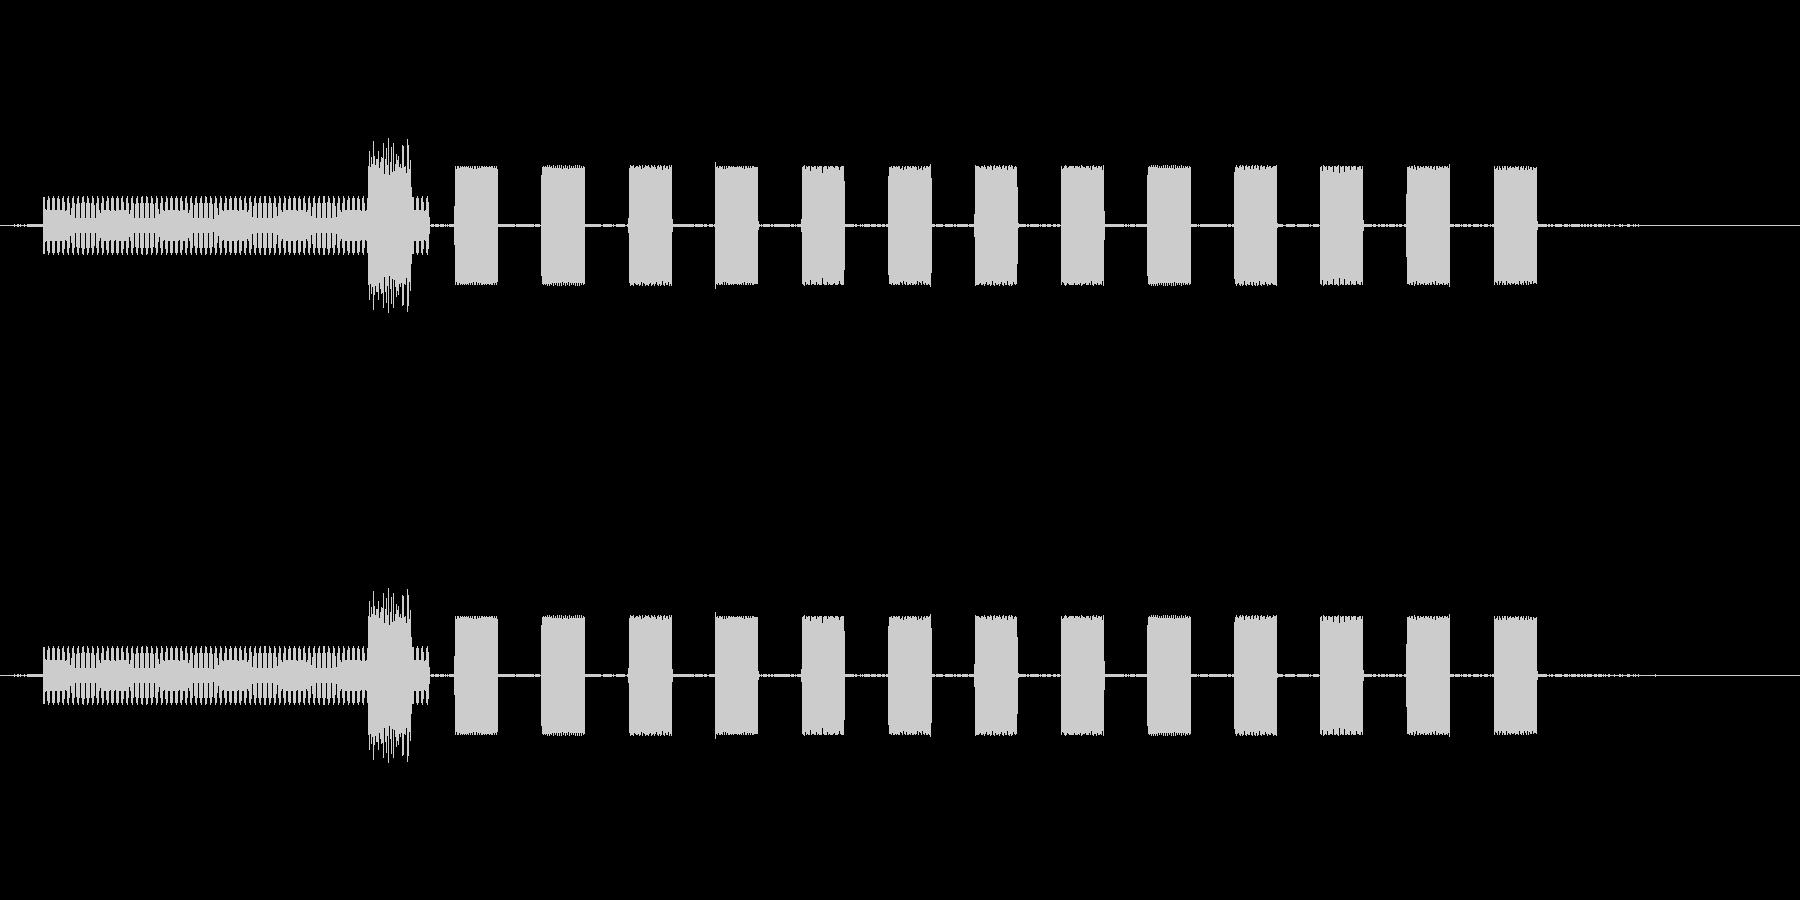 56kダイヤルアップモデムダイヤルの未再生の波形